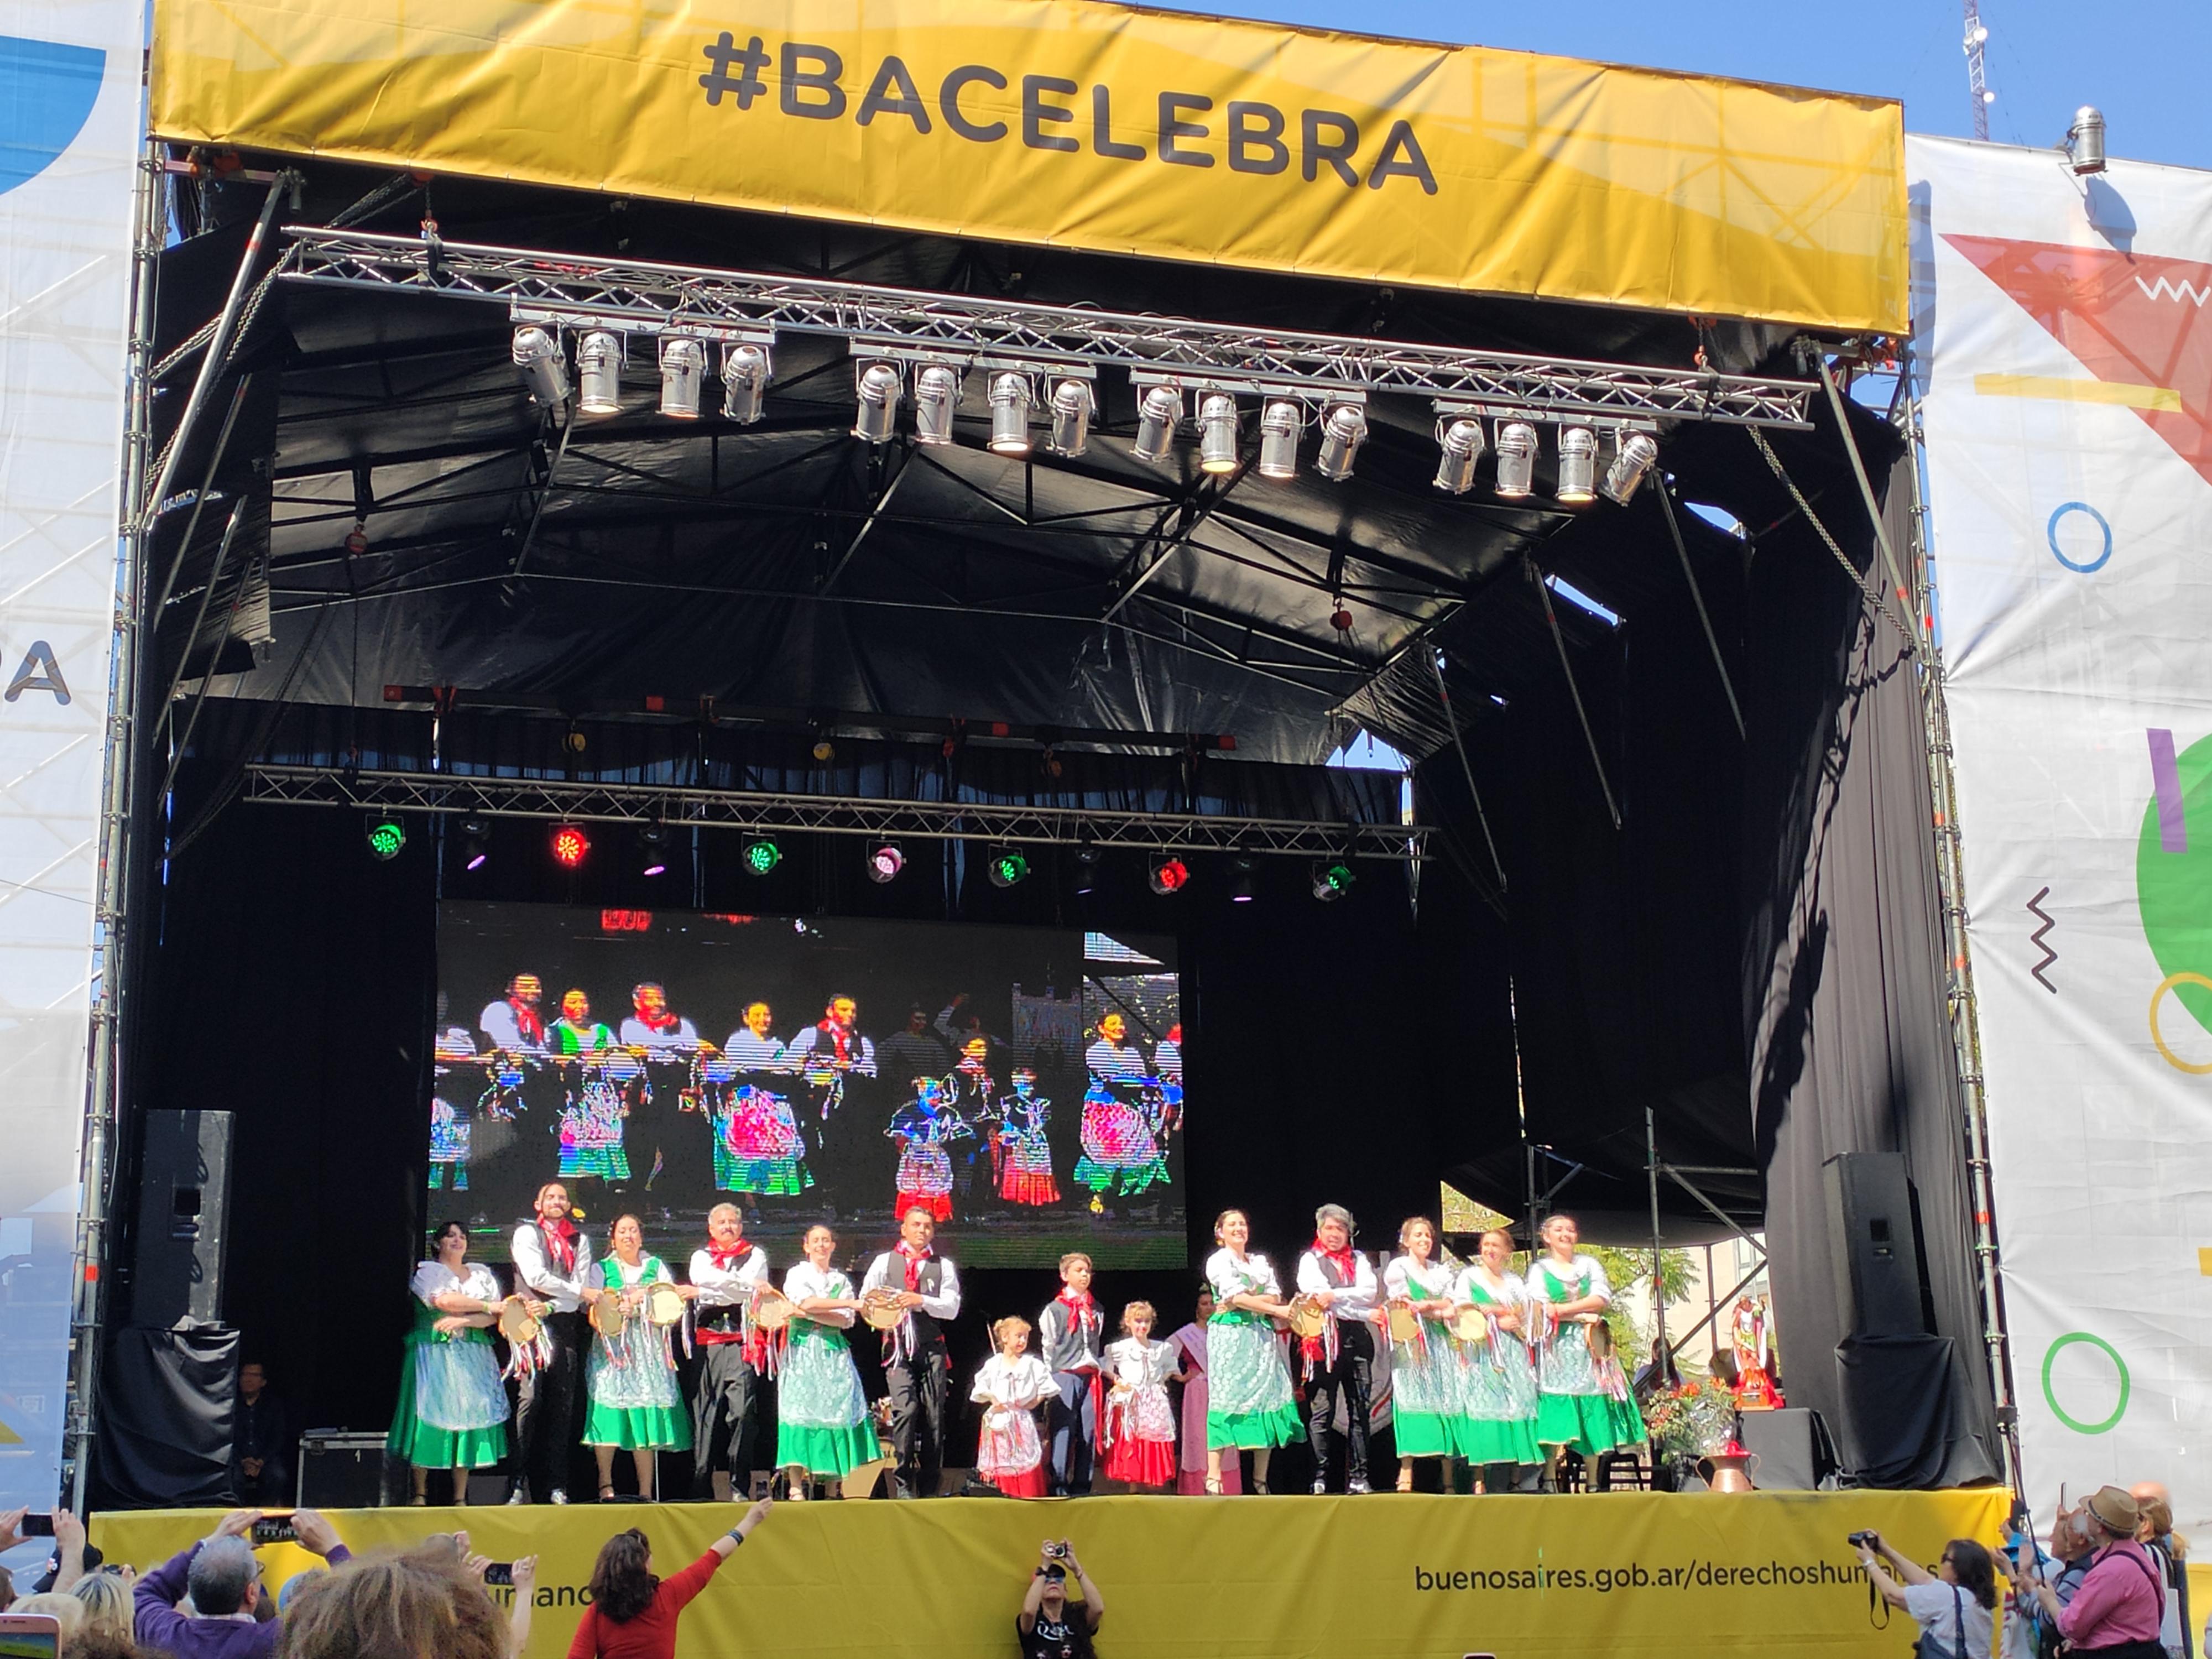 Fiesta Italiana - Ballet Calabresa